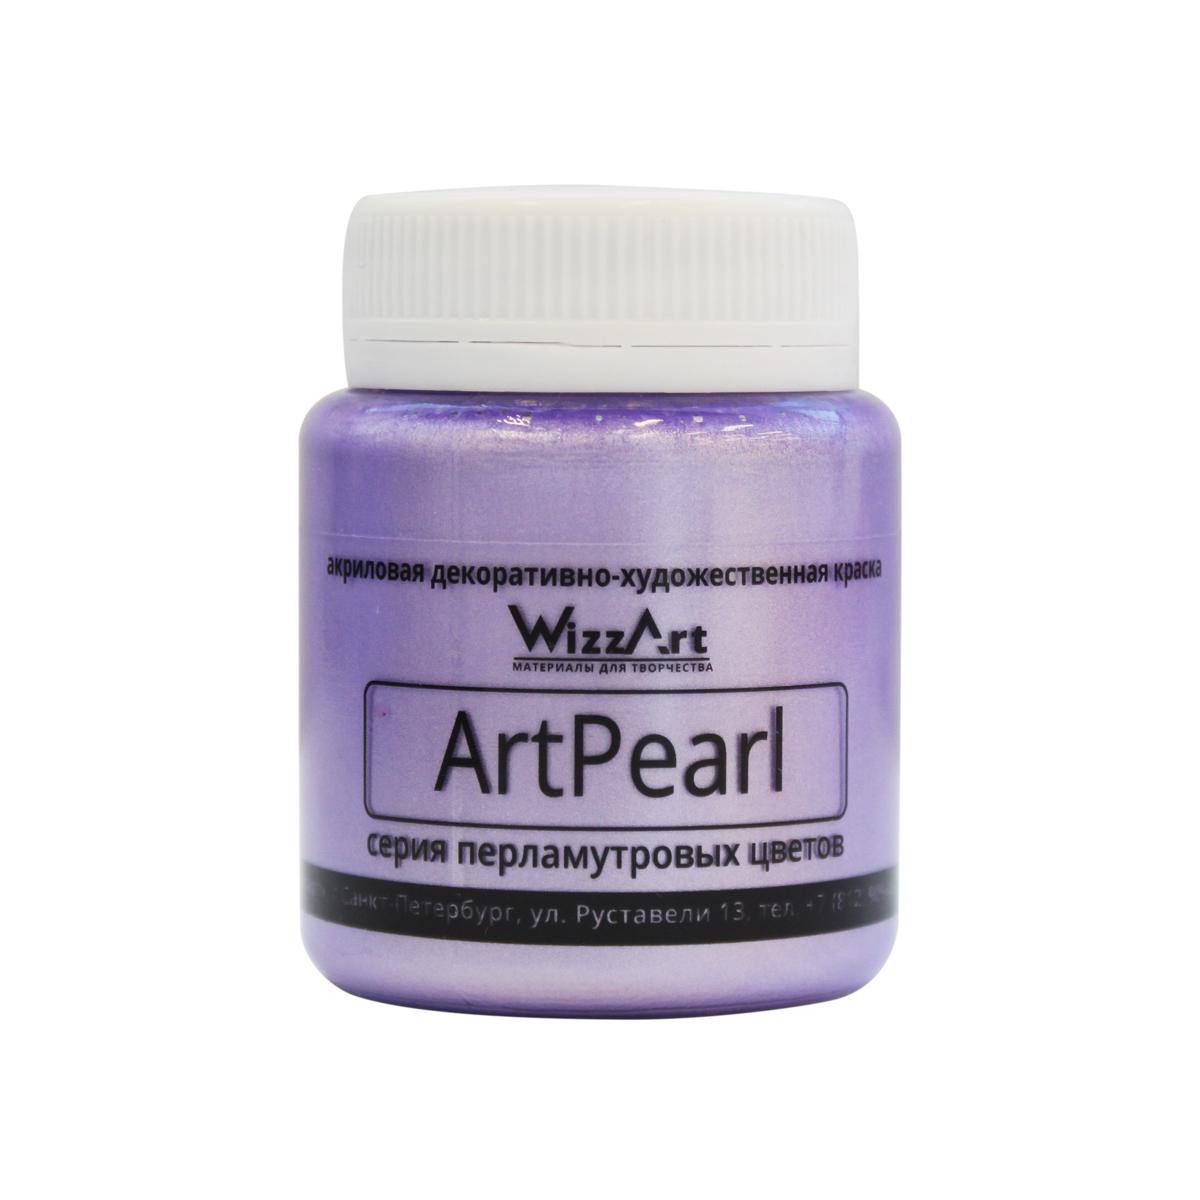 Краска акриловая Wizzart ArtPearl, цвет: фиолетовый, 80 мл501022